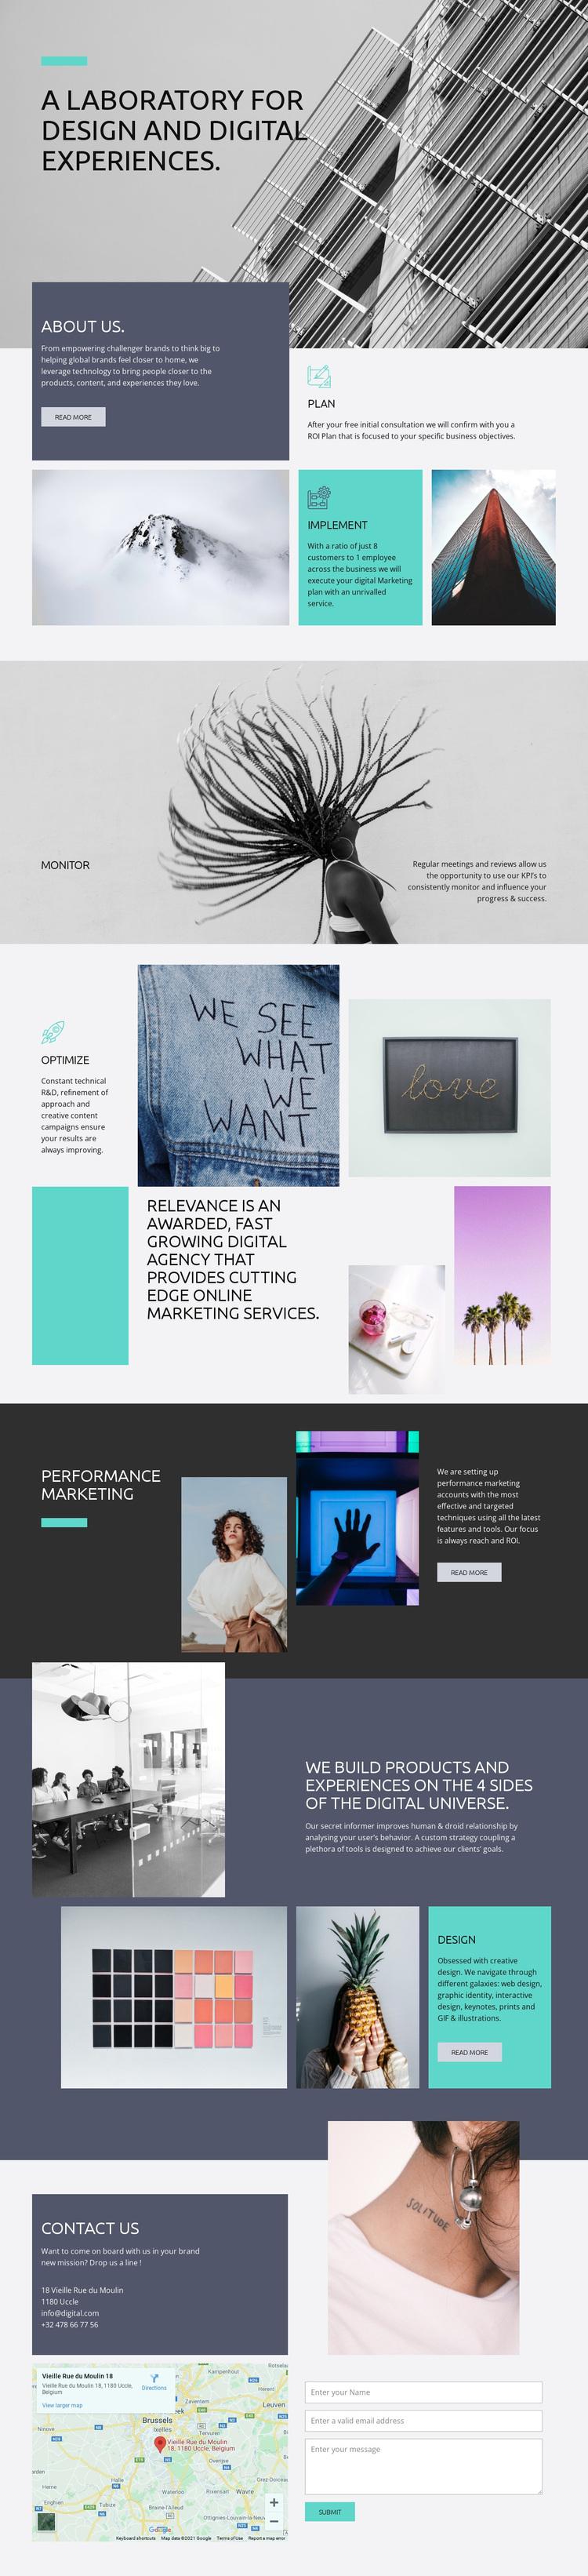 Creative lab for digital art Joomla Page Builder